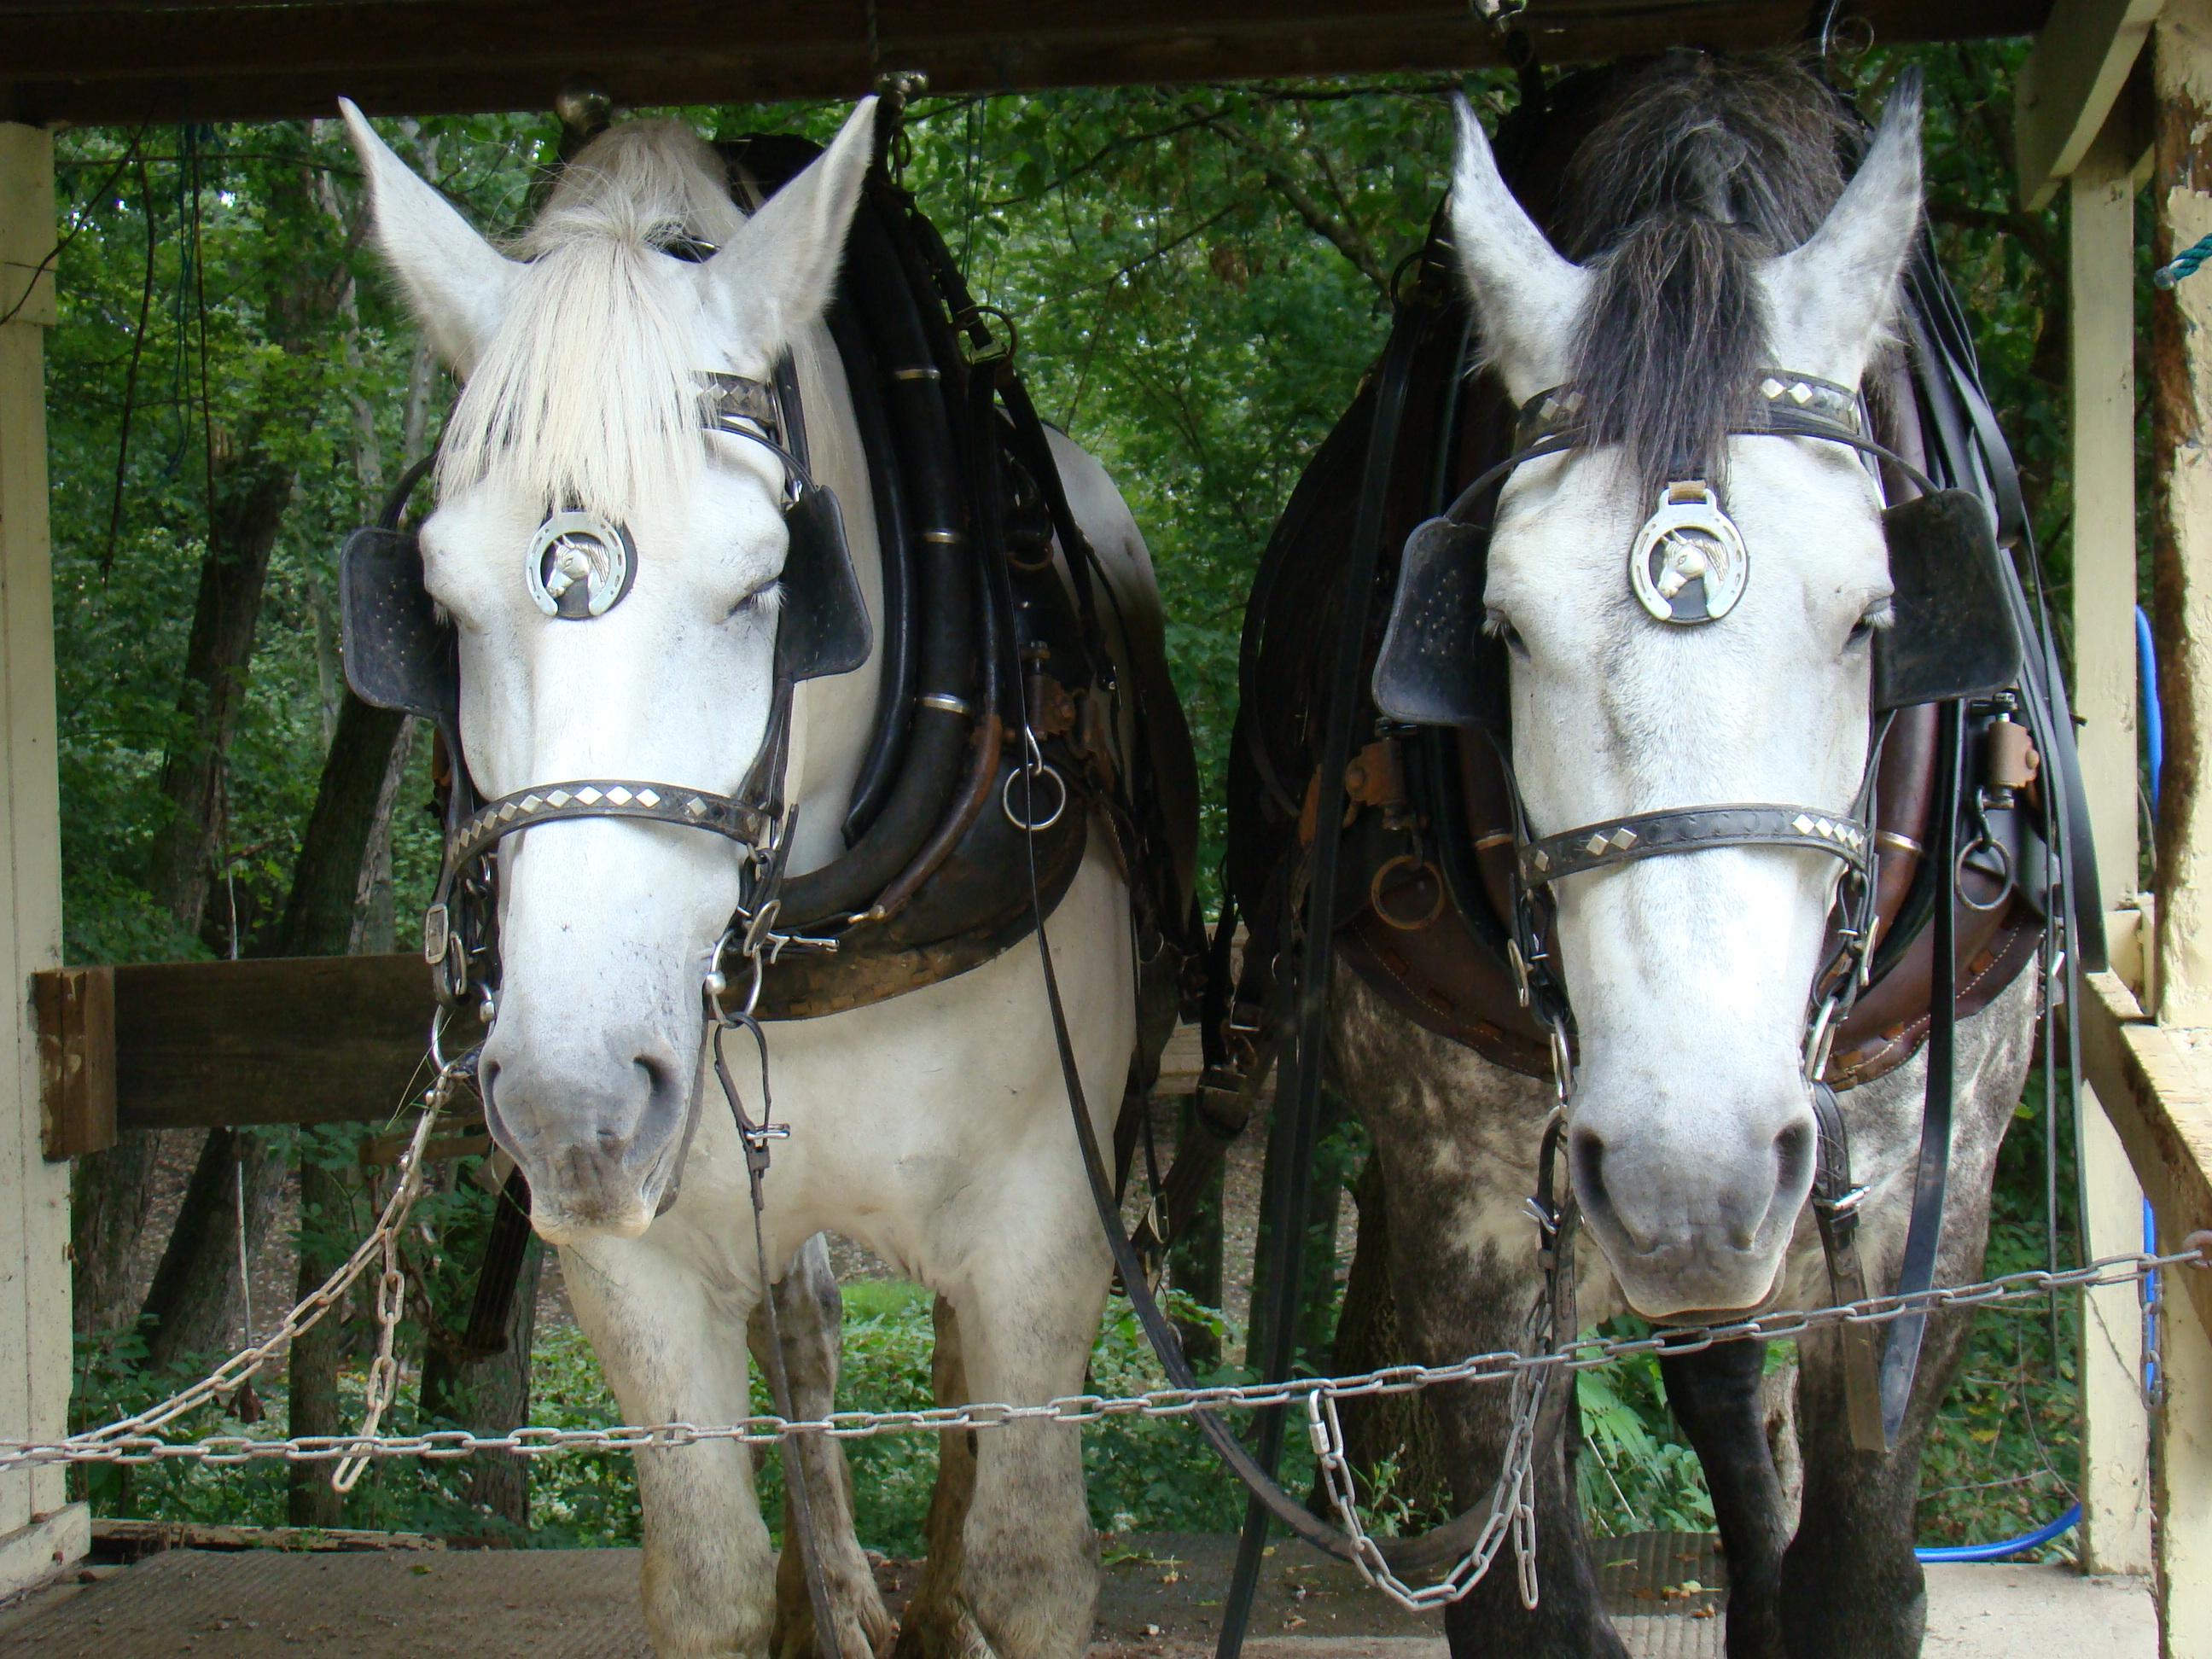 Monticello horses